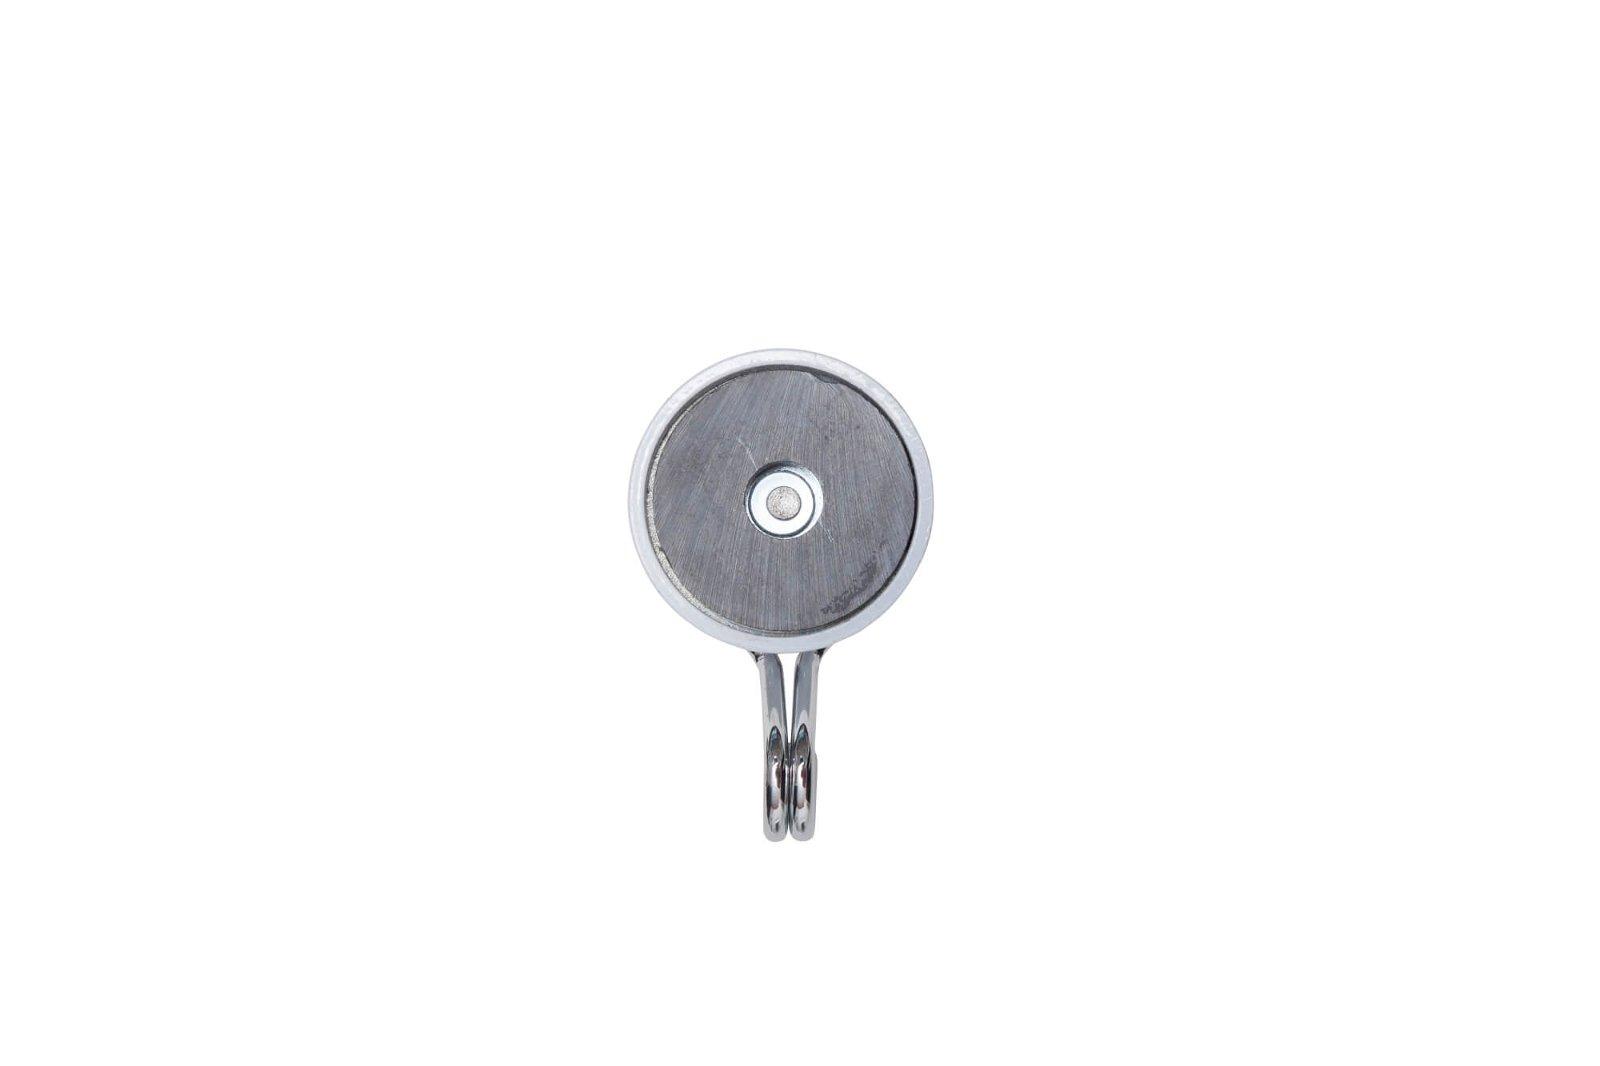 Magnet Karussell-Haken Ø 35 mm, 5 kg Haftkraft, 2 St./Set, weiß